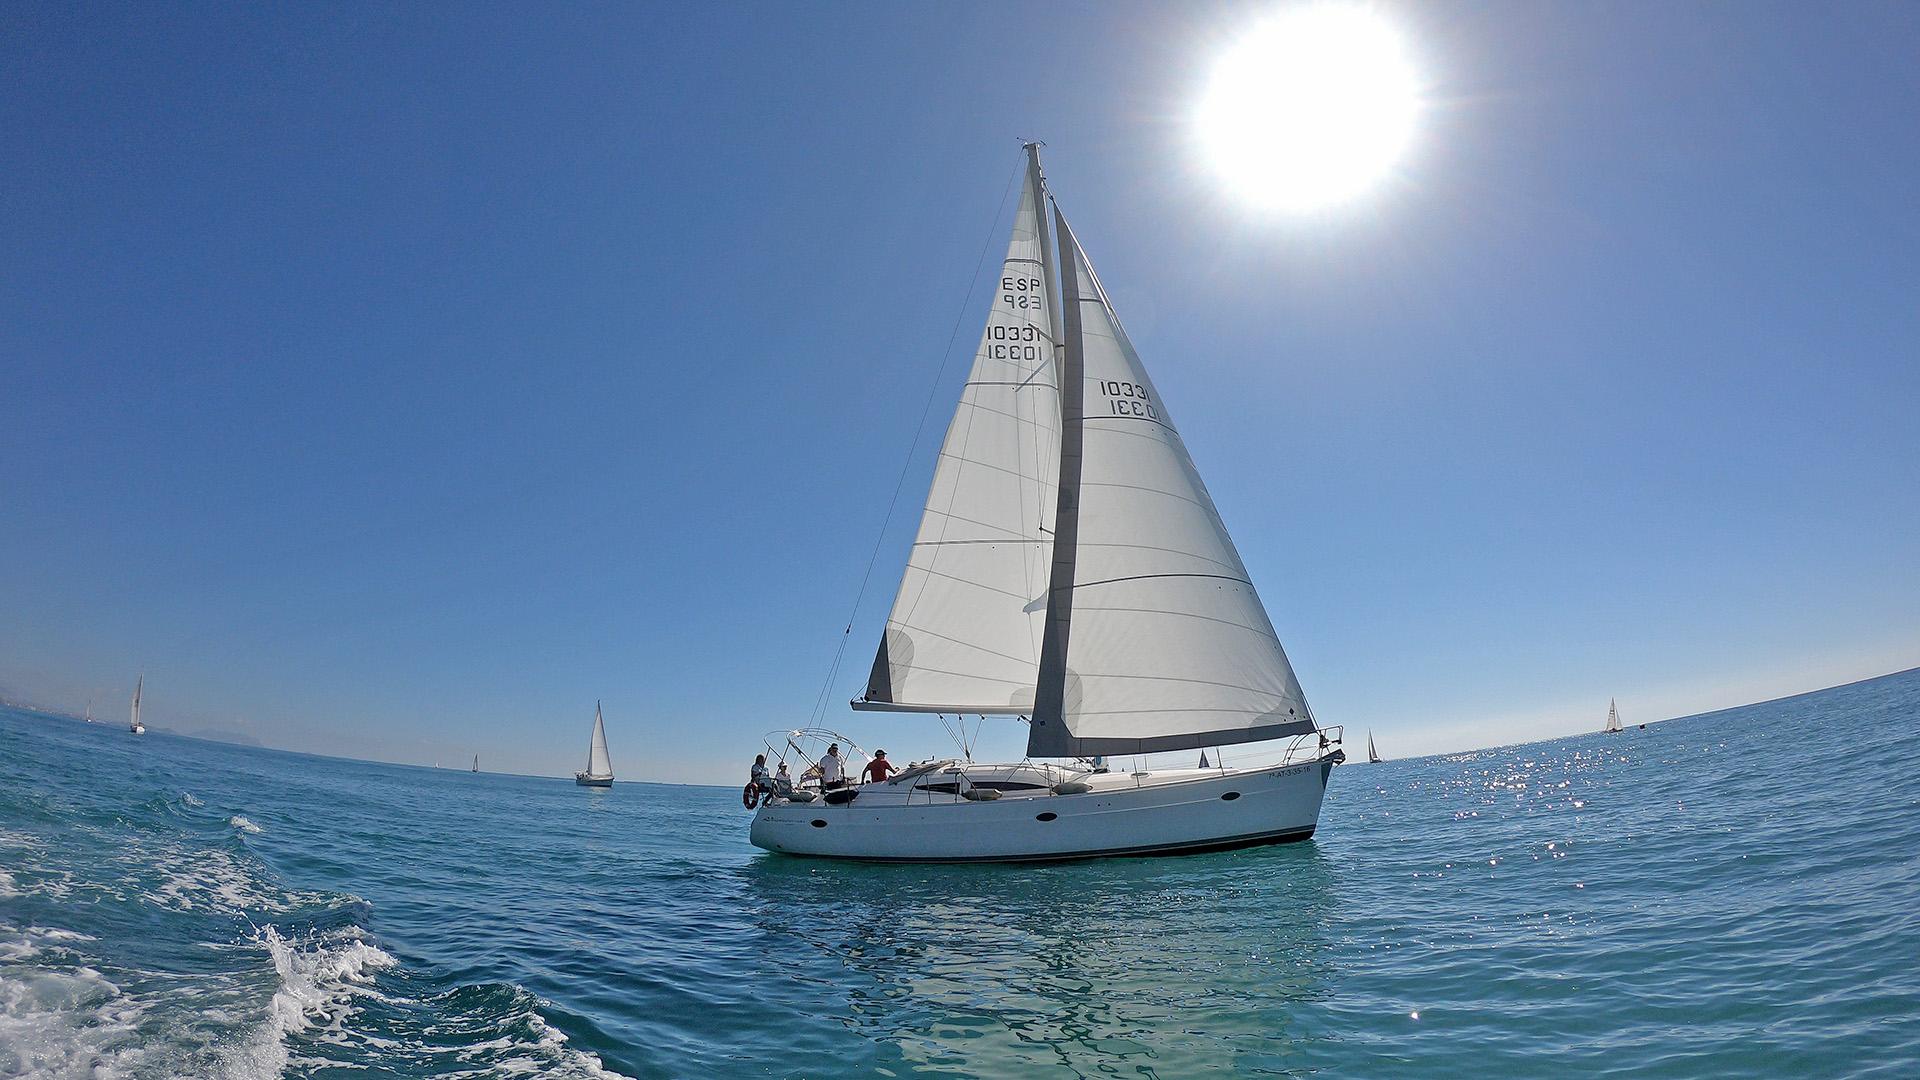 Liga Primer Semestre de Vela Crucero . Club Náutico Campello